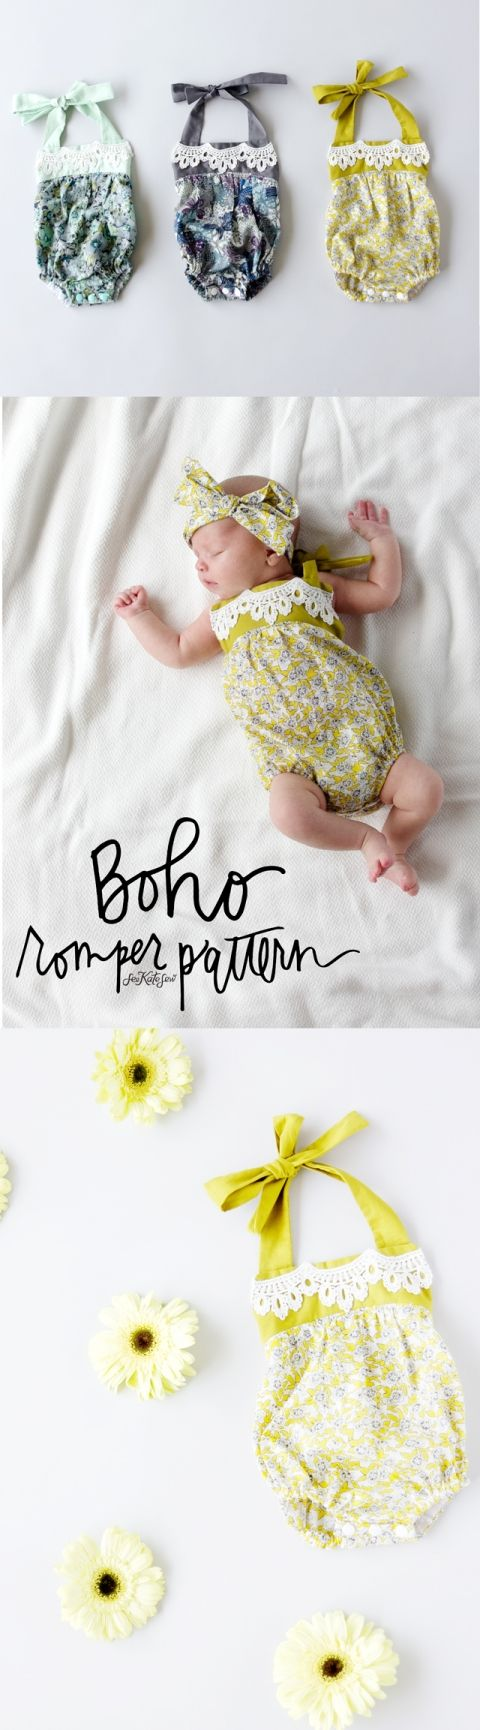 Pin de MYRIAM CAMACHO en Moda infantil | Pinterest